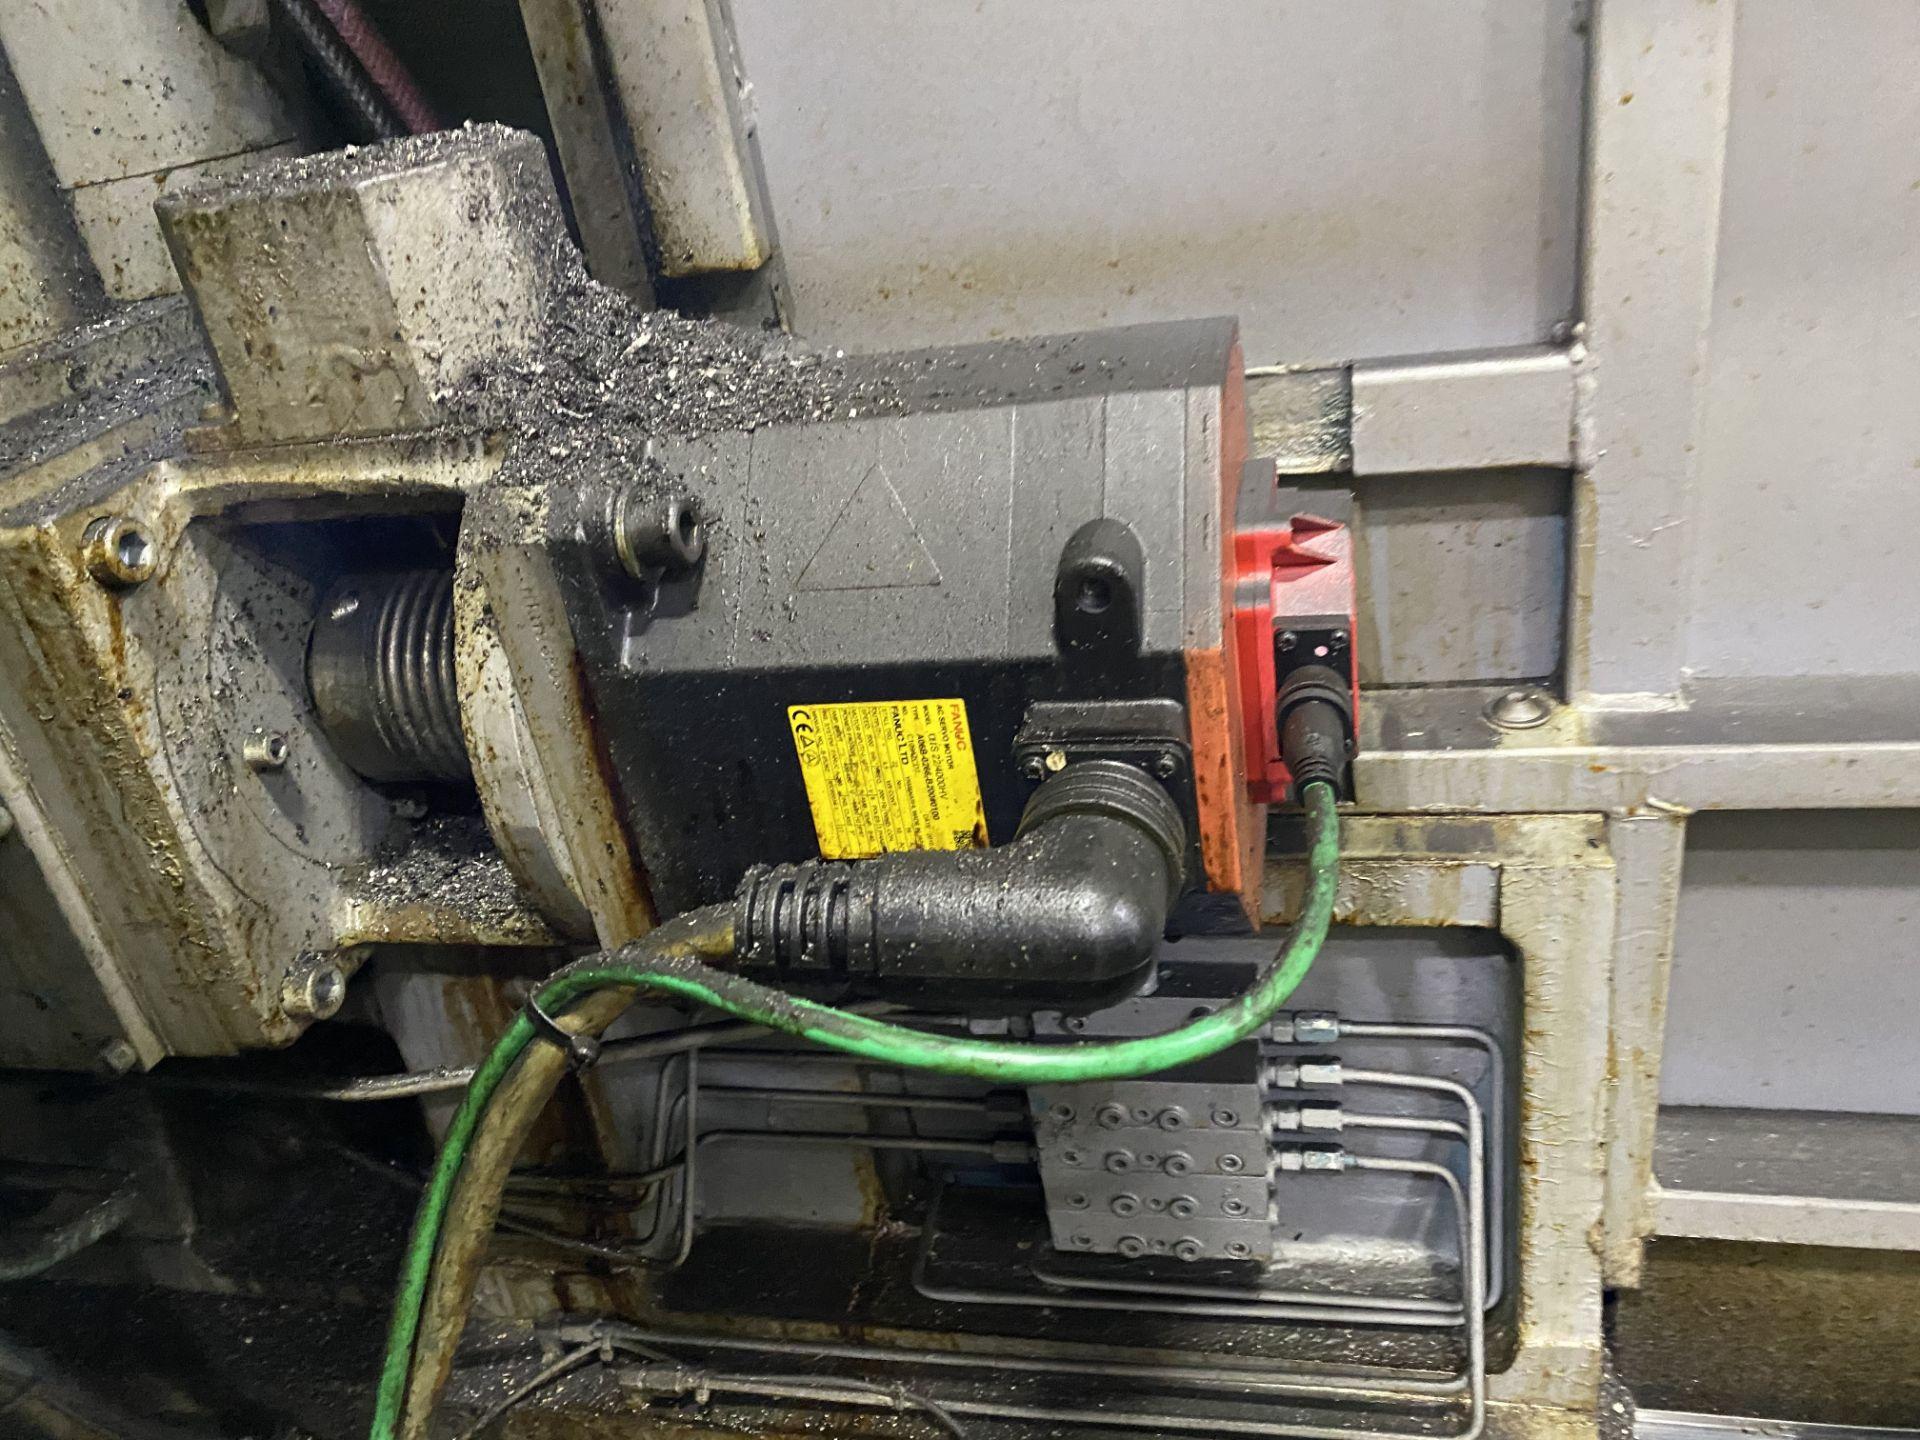 Cincinnati Cinturn 12 CNC Lathe w/ Fanuc Control RETROFIT ***PARTS MACHINE, NO CONTROLLER** - Image 7 of 8